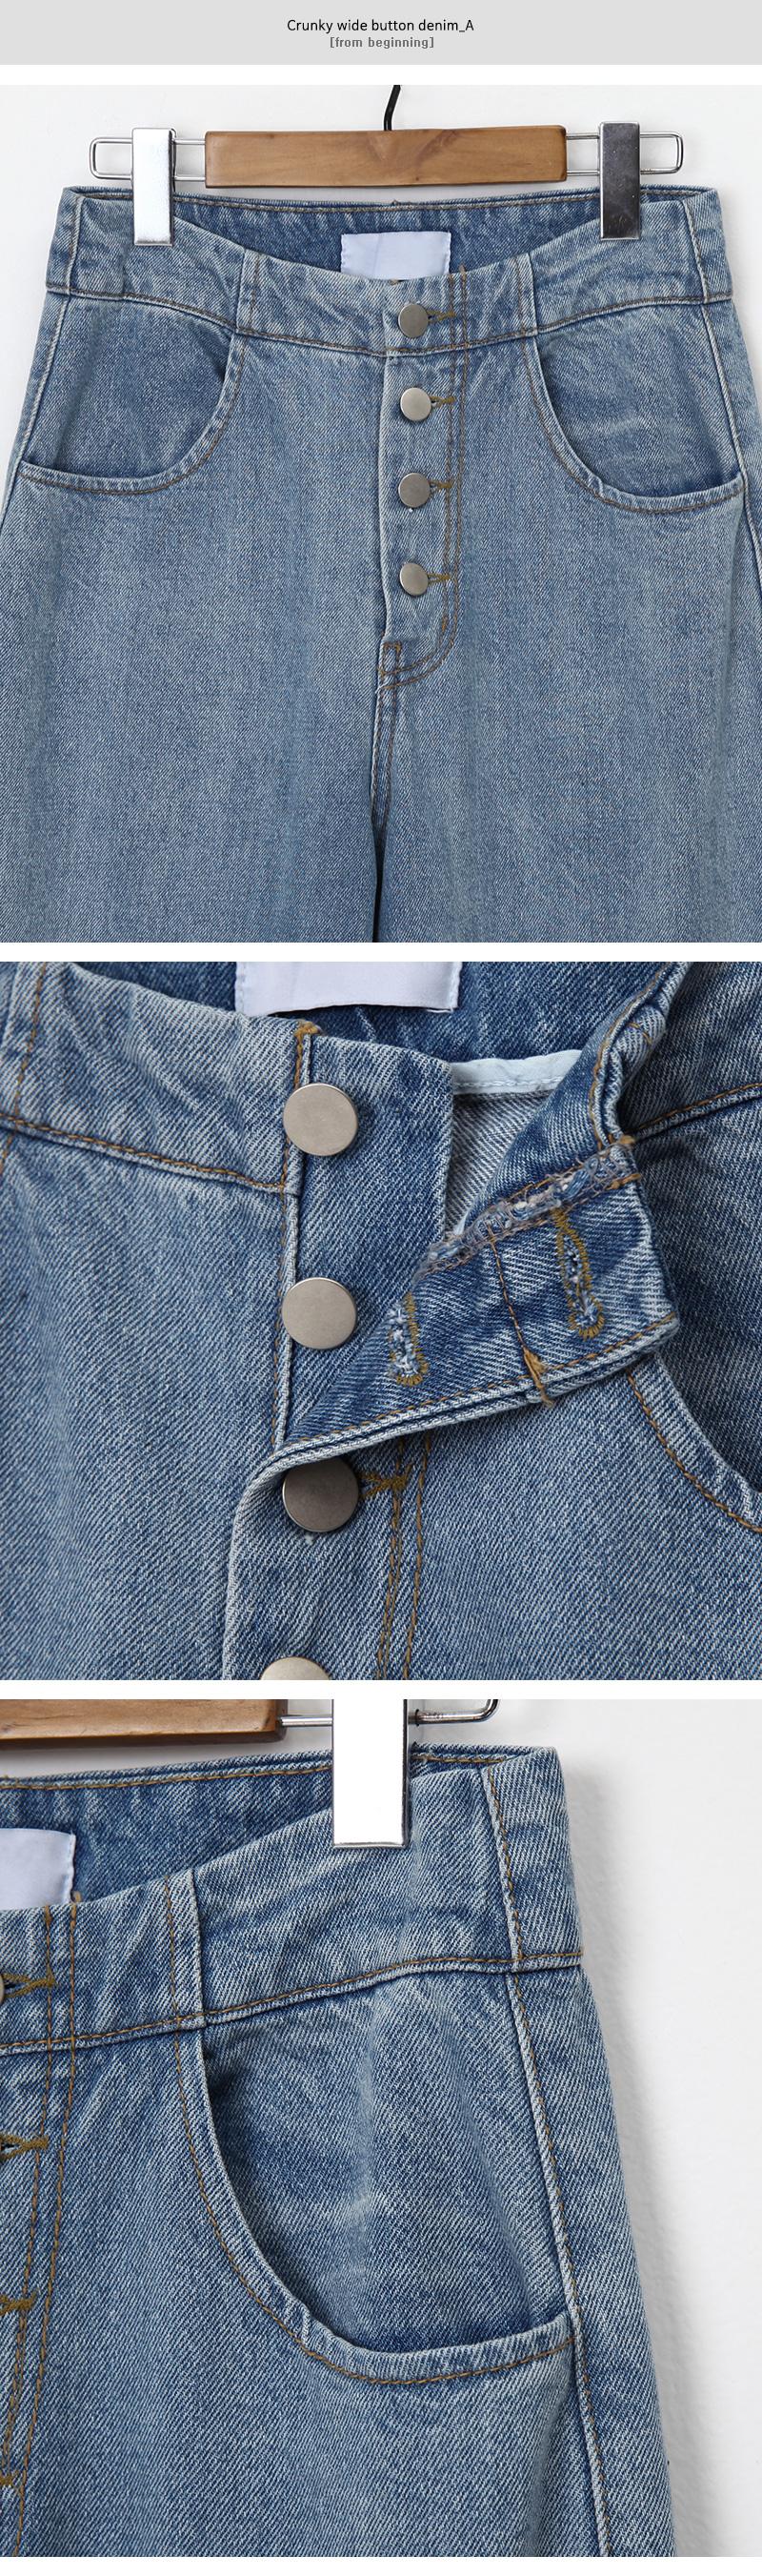 Crunky wide button denim_A